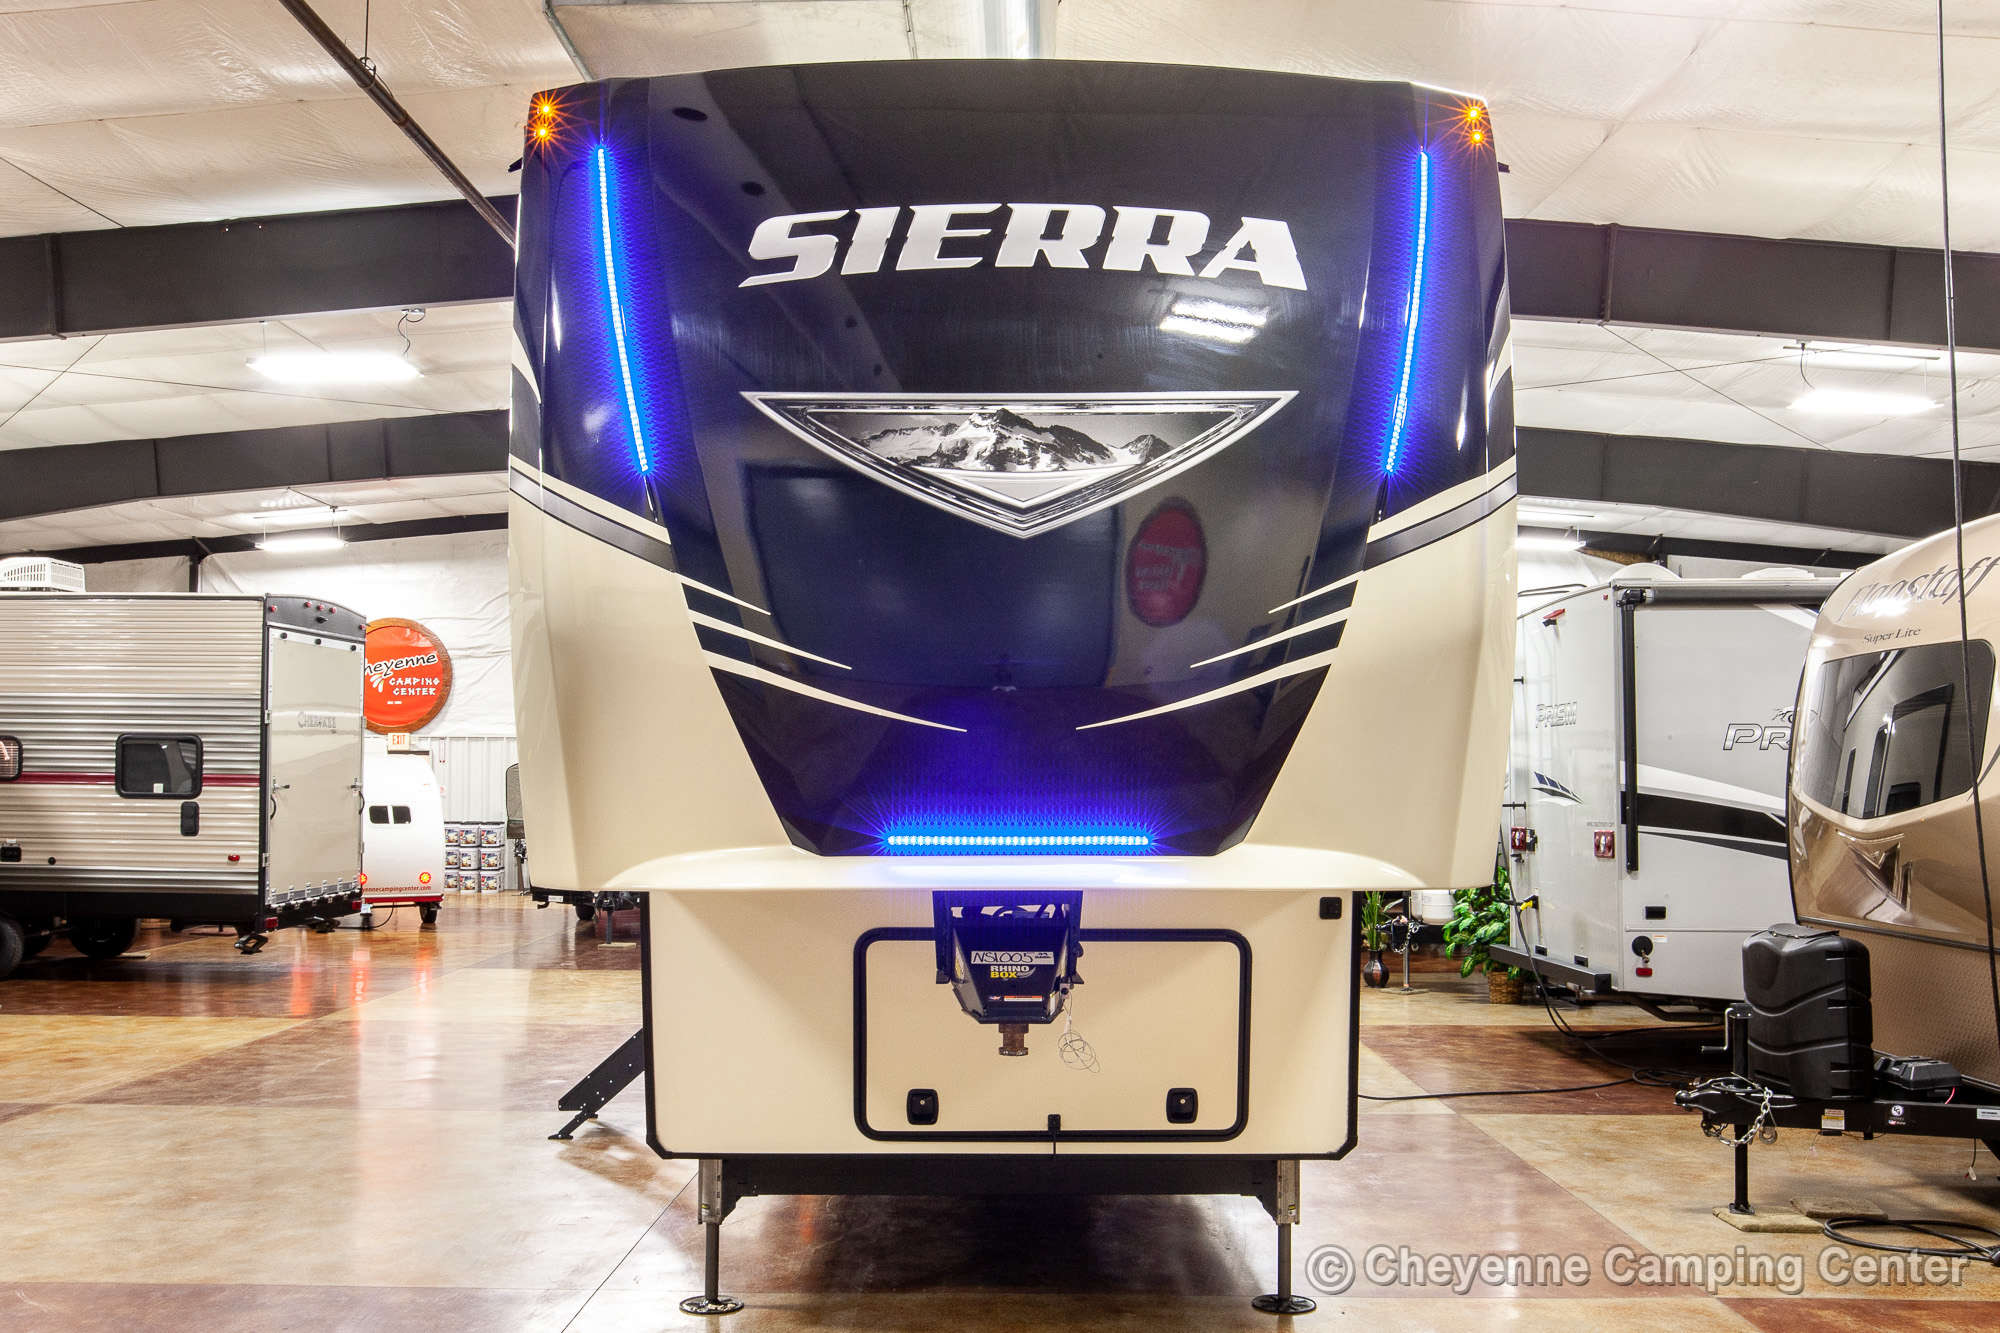 2021 Forest River Sierra 39BARK Fifth Wheel Exterior Image